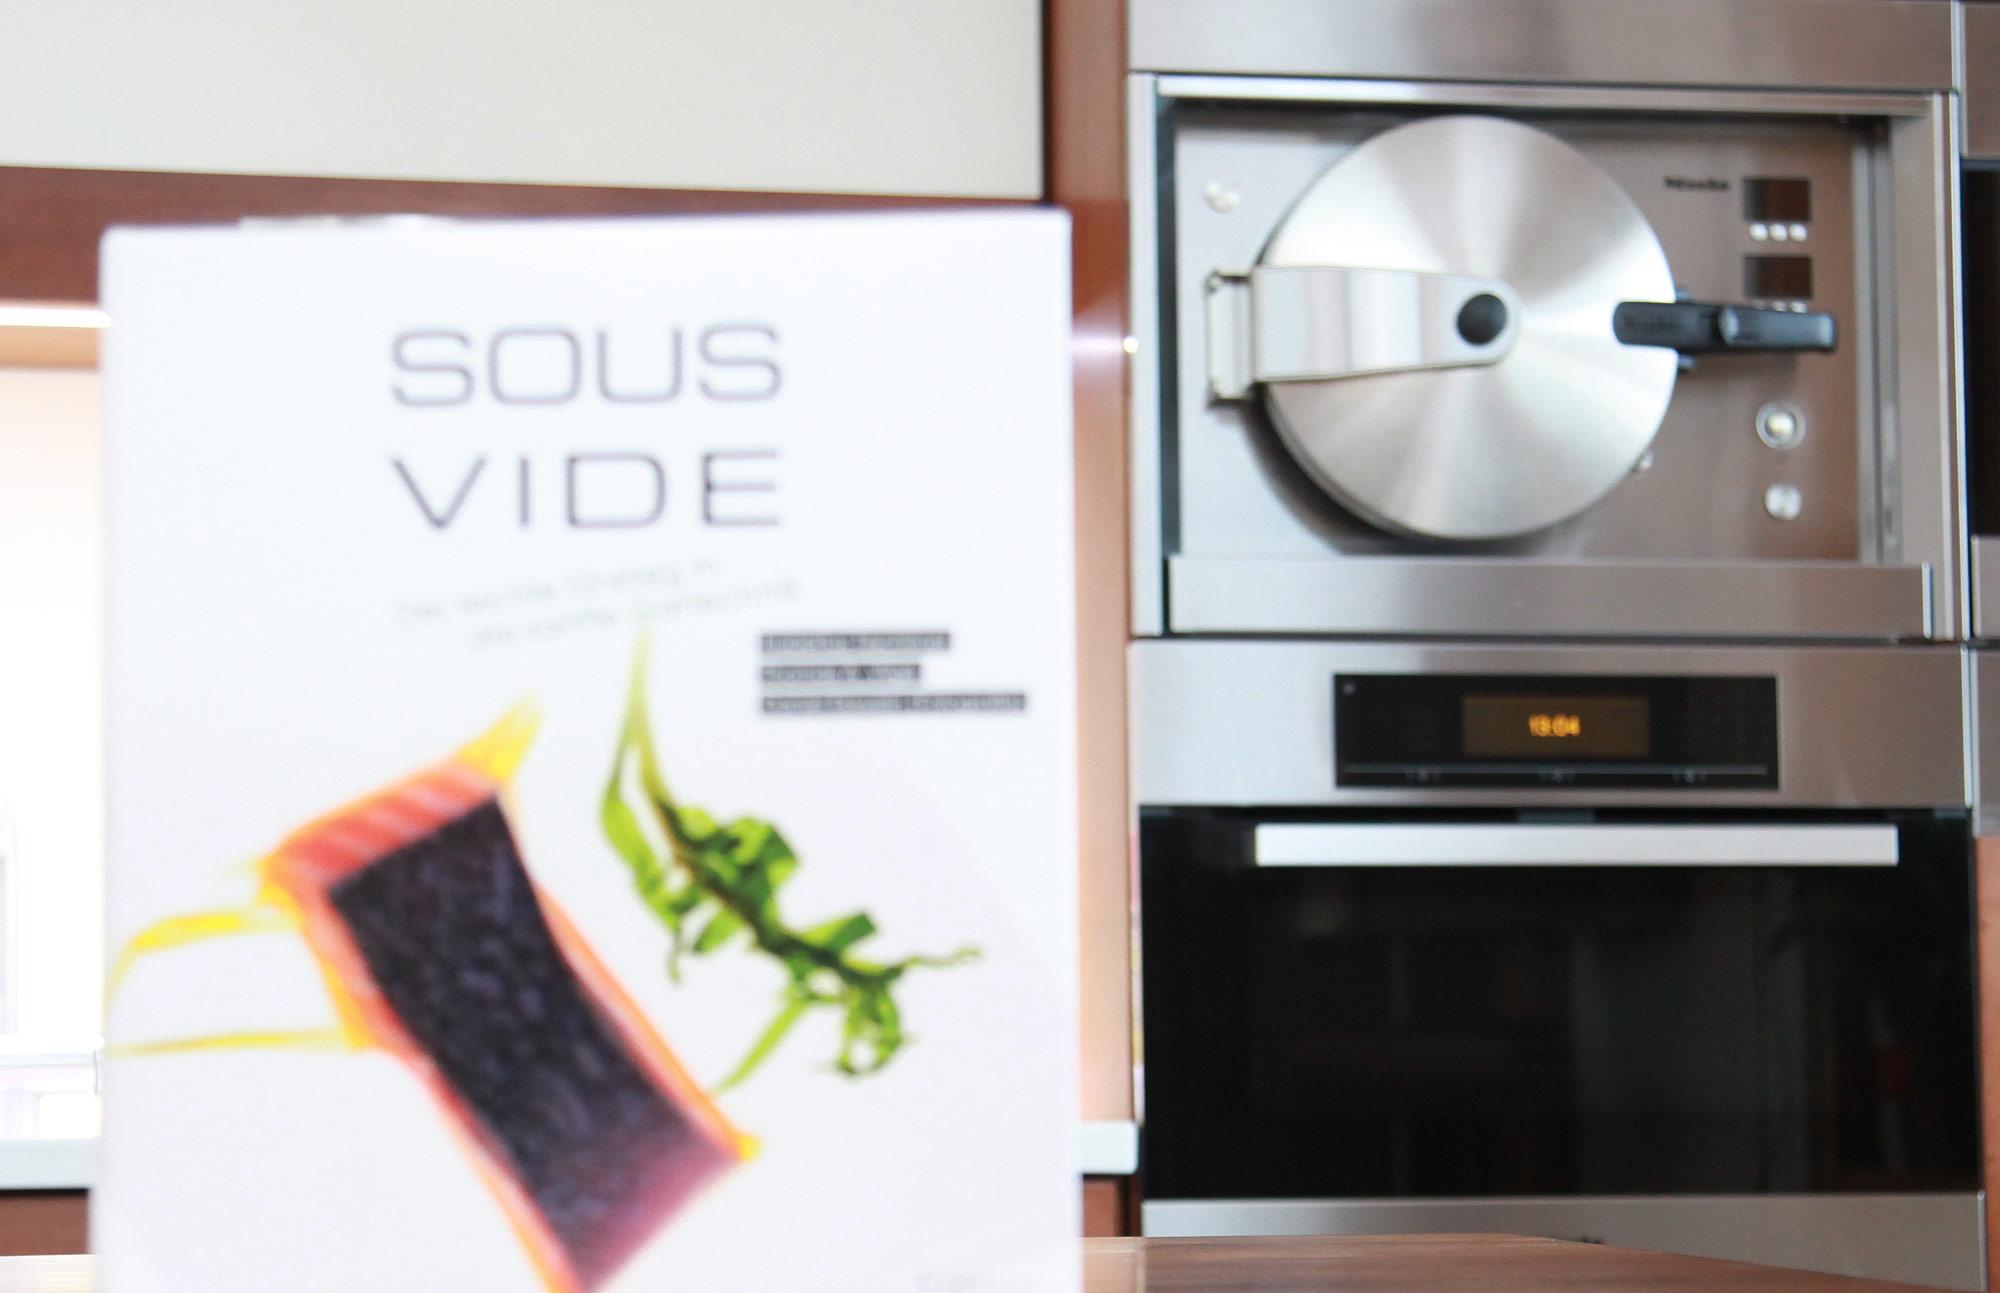 m belmesse 2013 teil 5 sous vide garen im druckdampfgarer das nachhaltigkeitsblog der. Black Bedroom Furniture Sets. Home Design Ideas